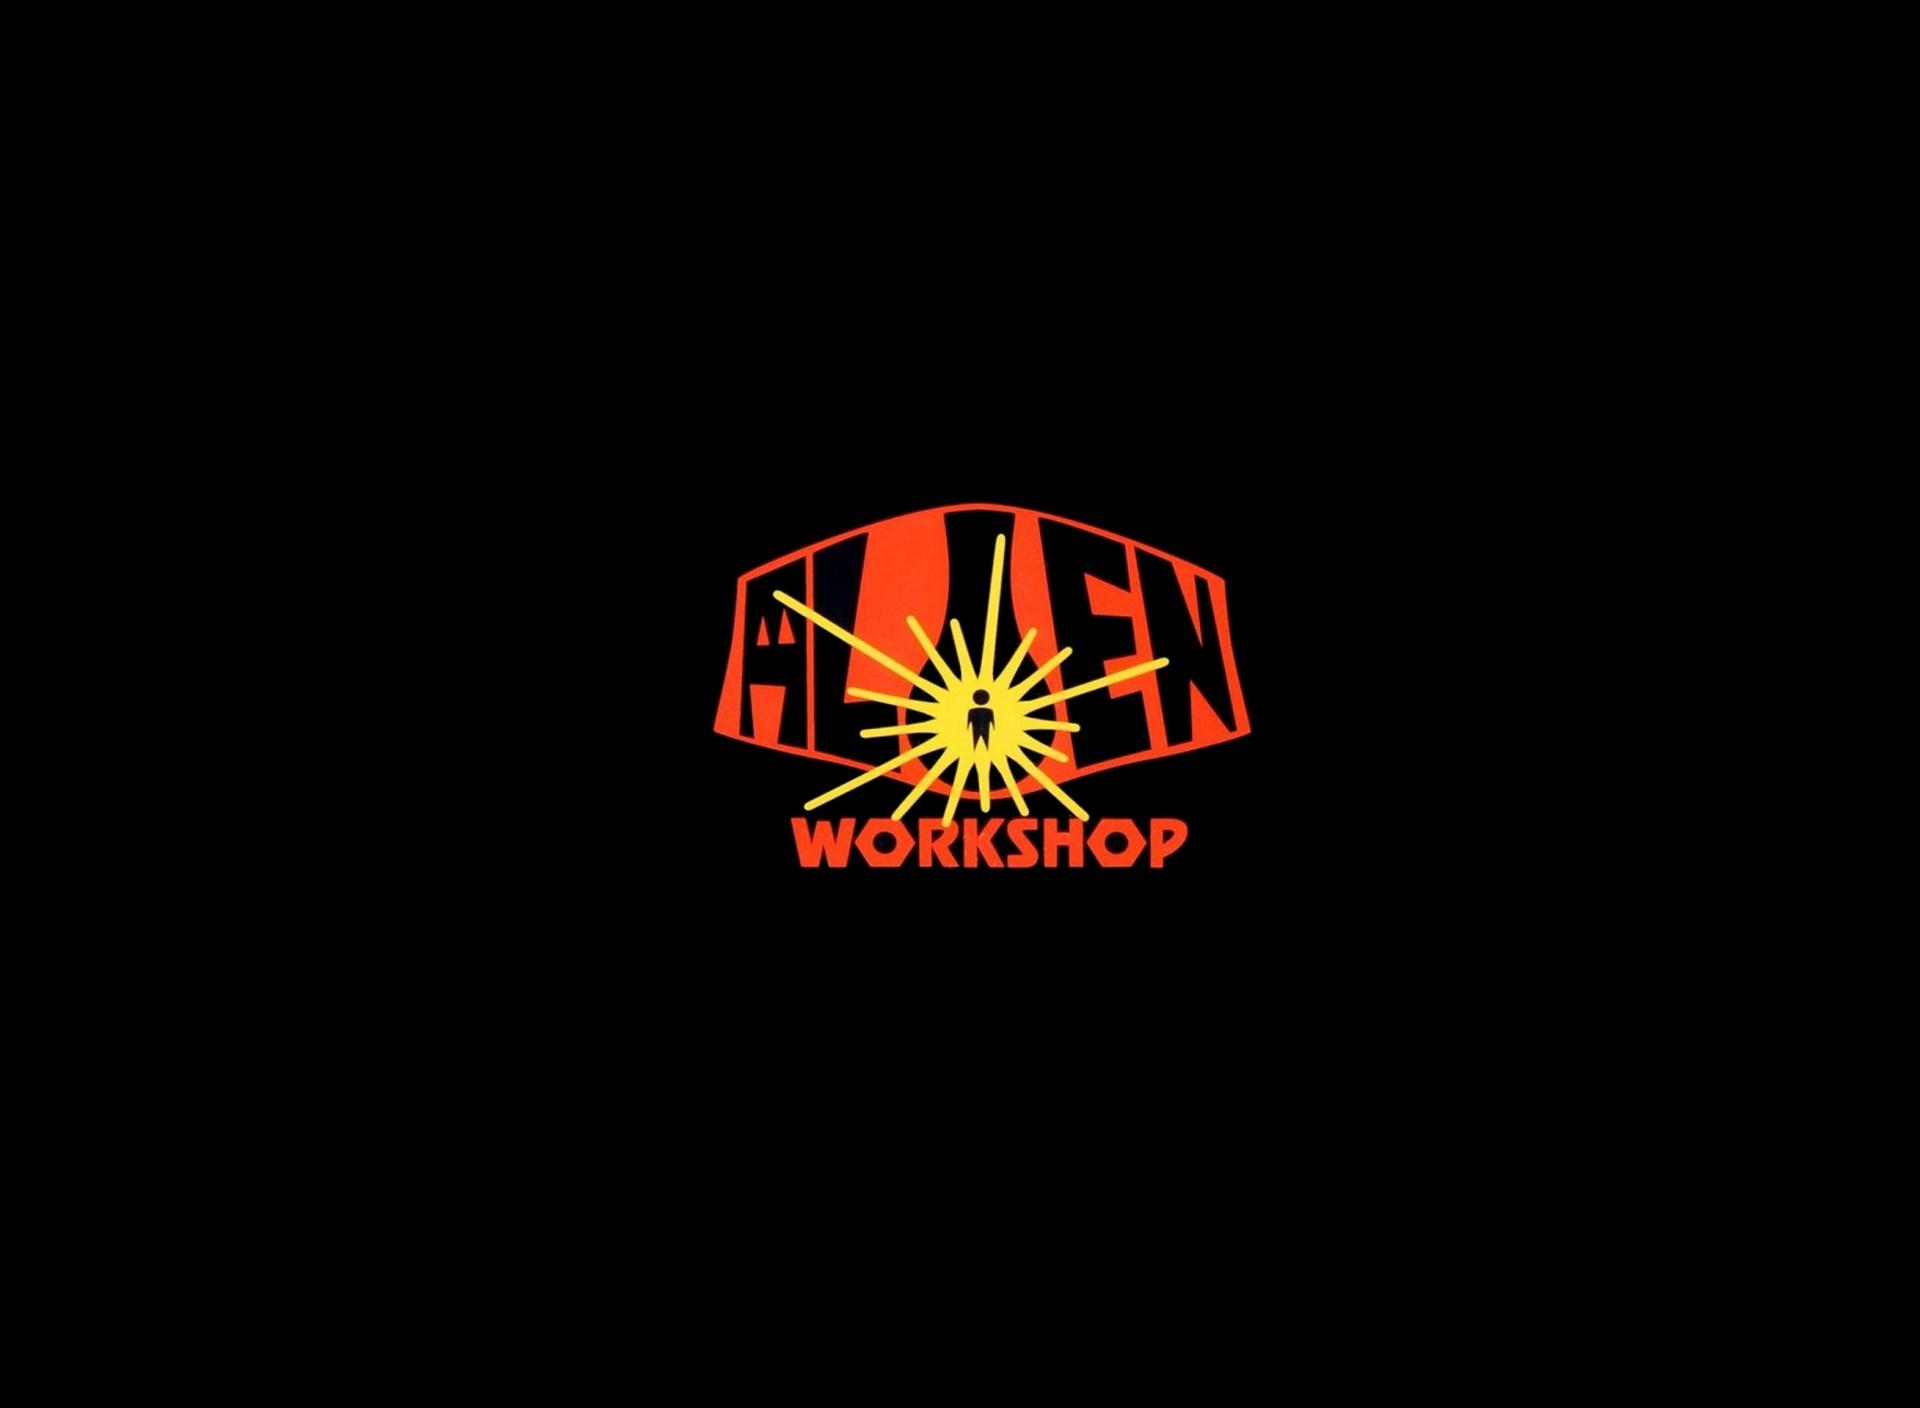 alien workshop wallpaper -#main